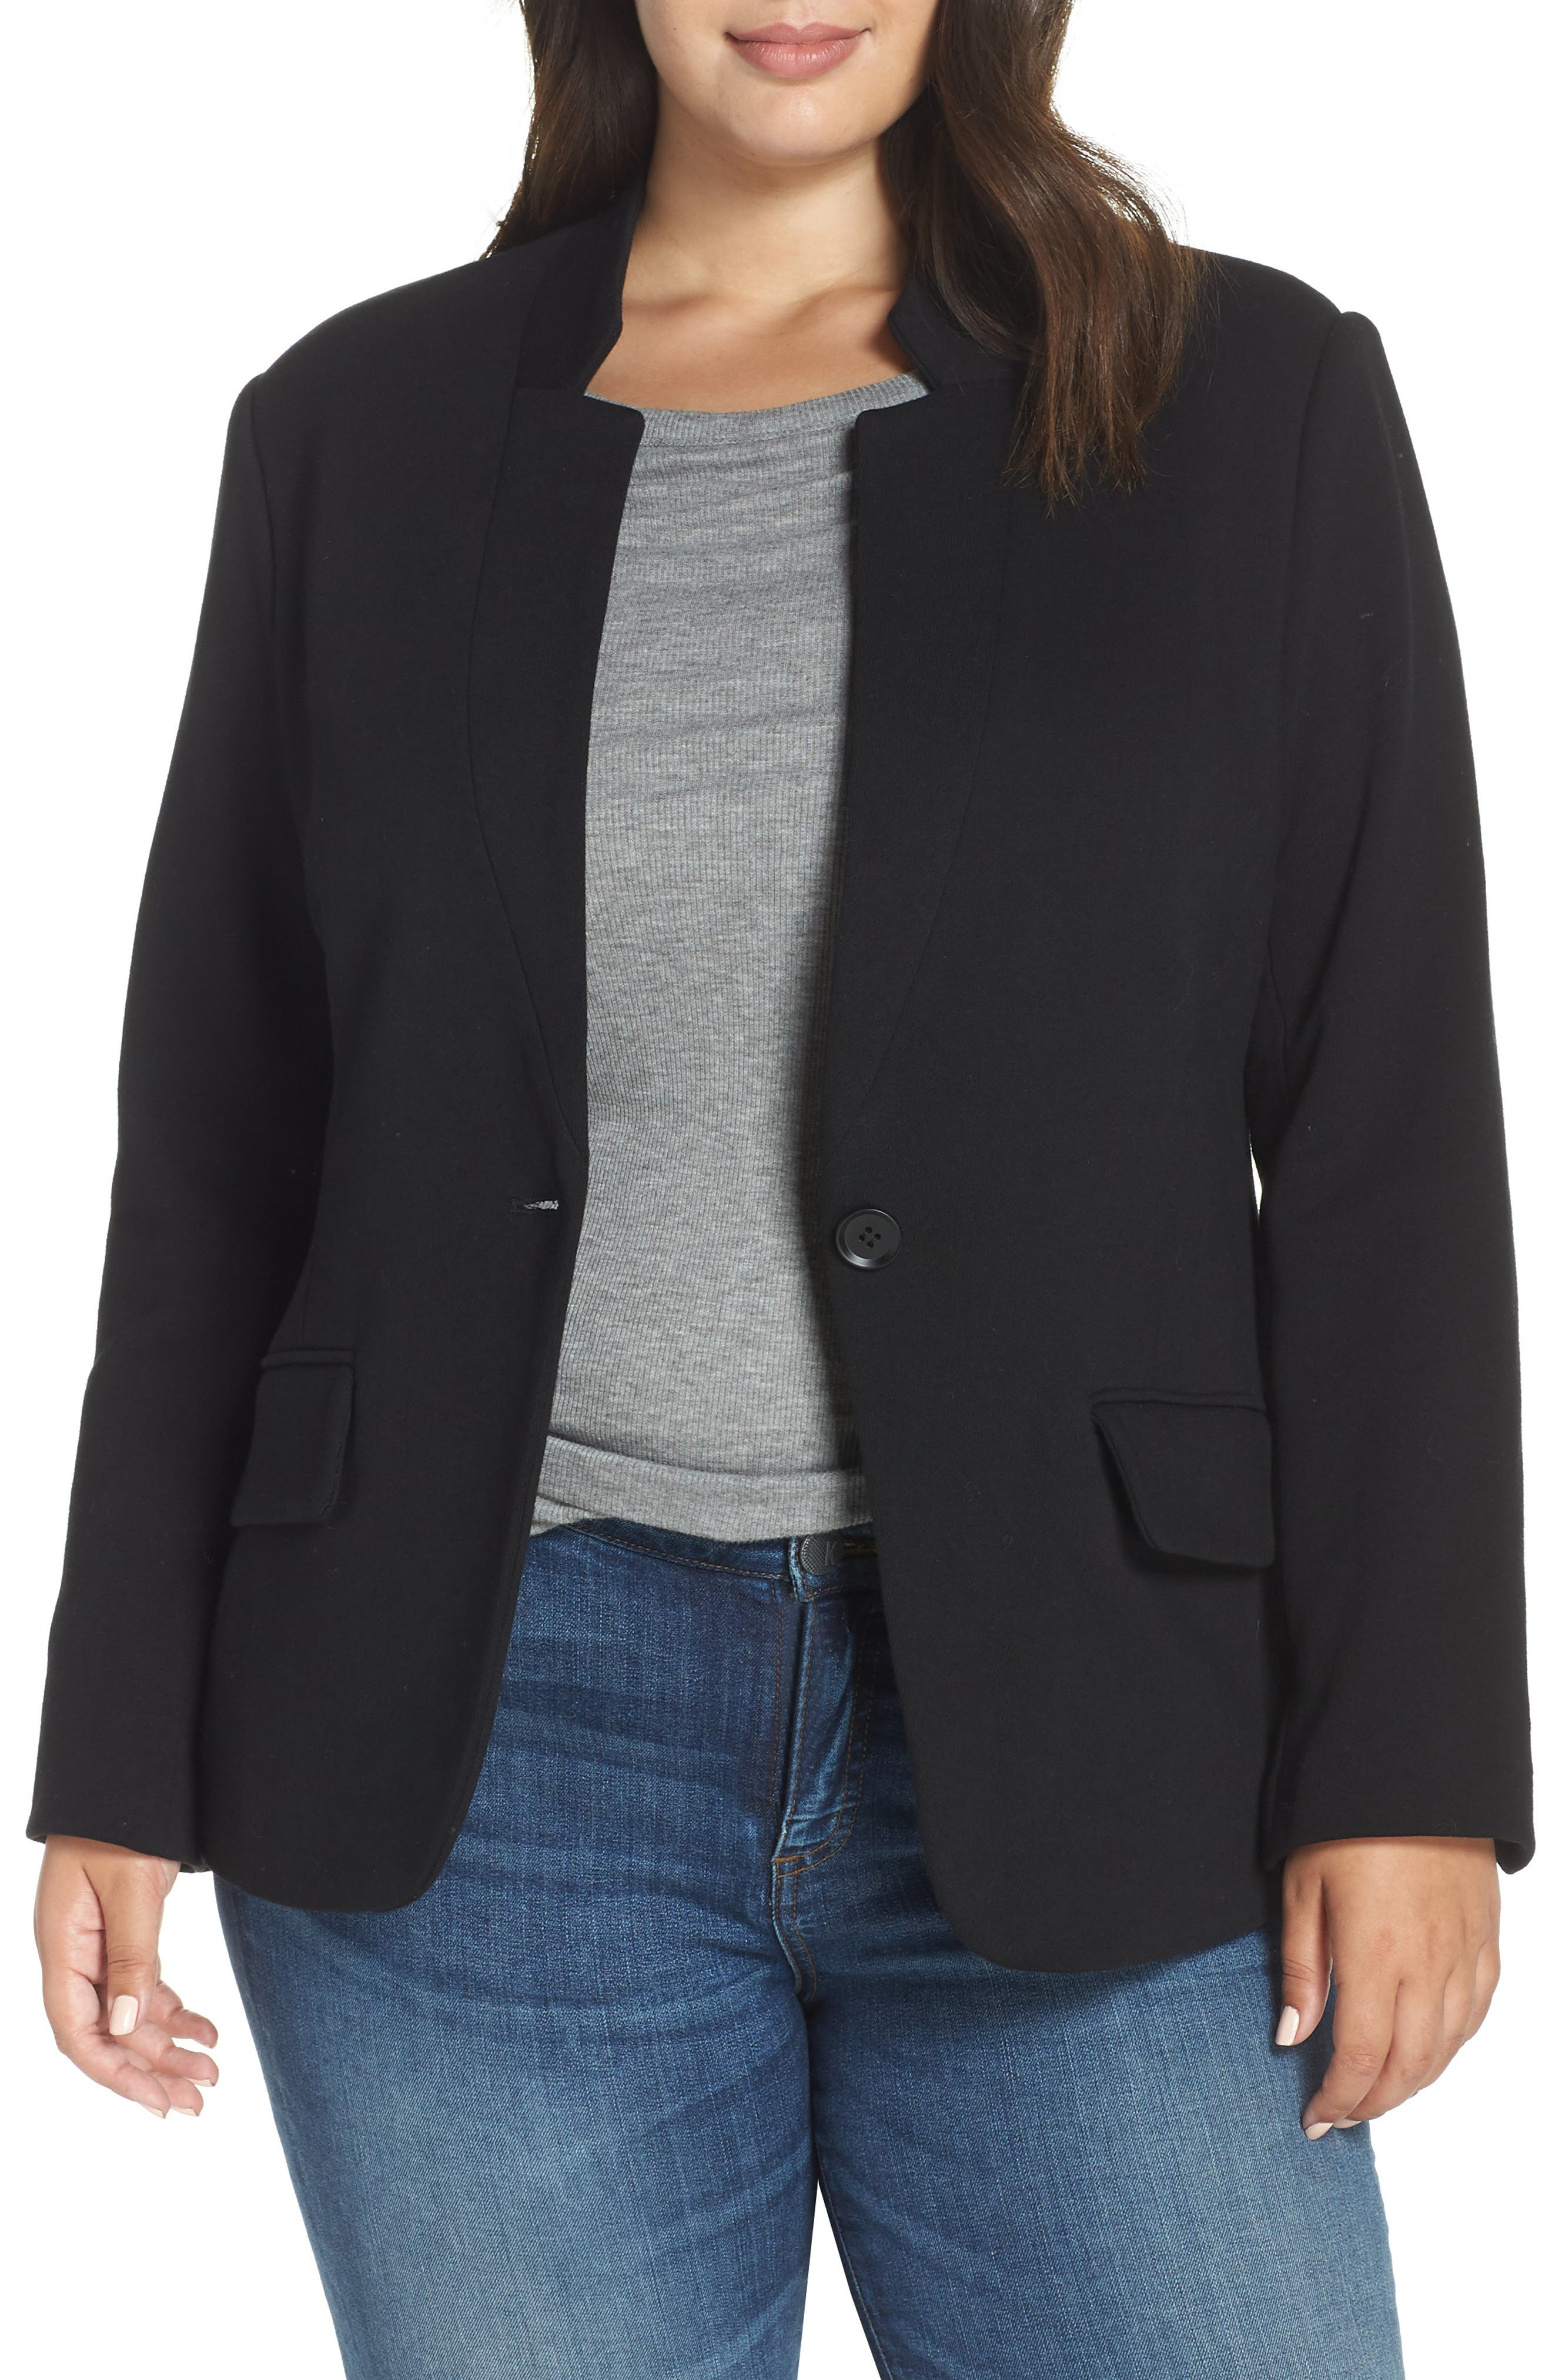 GIBSON Inverted Notch Collar Cotton Blend Blazer, Main, color, BLACK